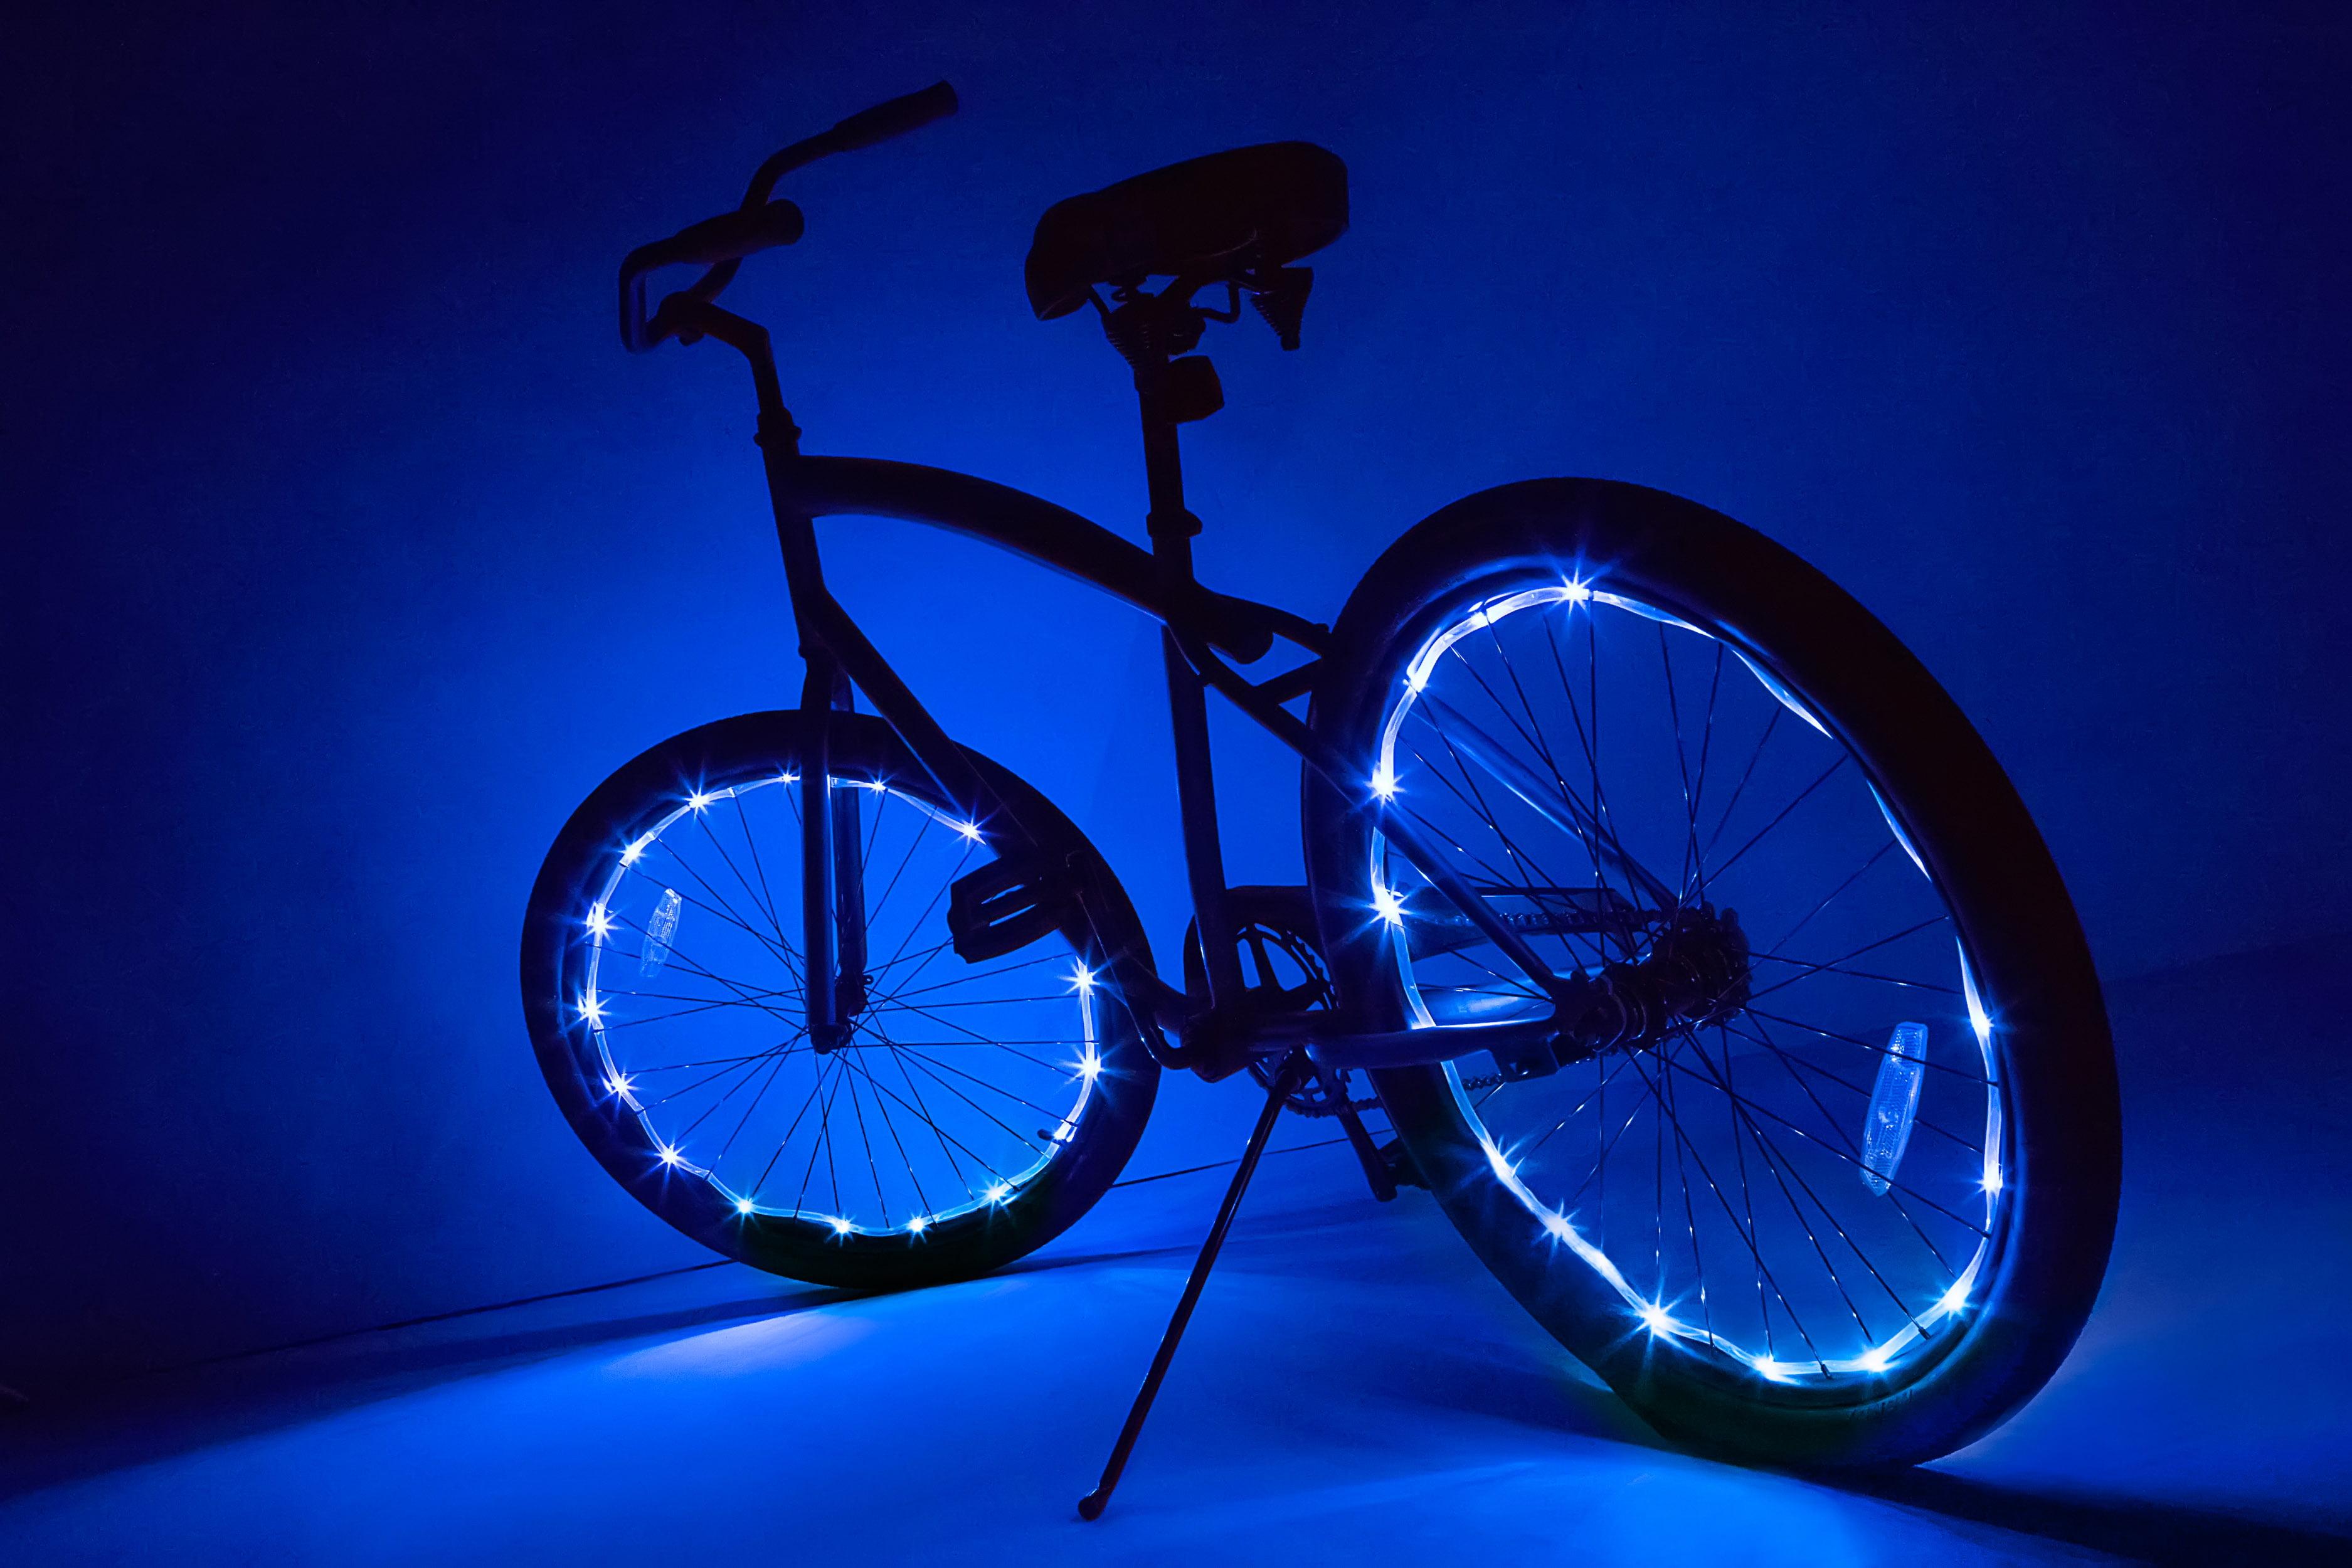 Bike Bicycle Wheel Tire Valve Cap Spoke 16 LED 4-Color Lights Lamp 30 changes